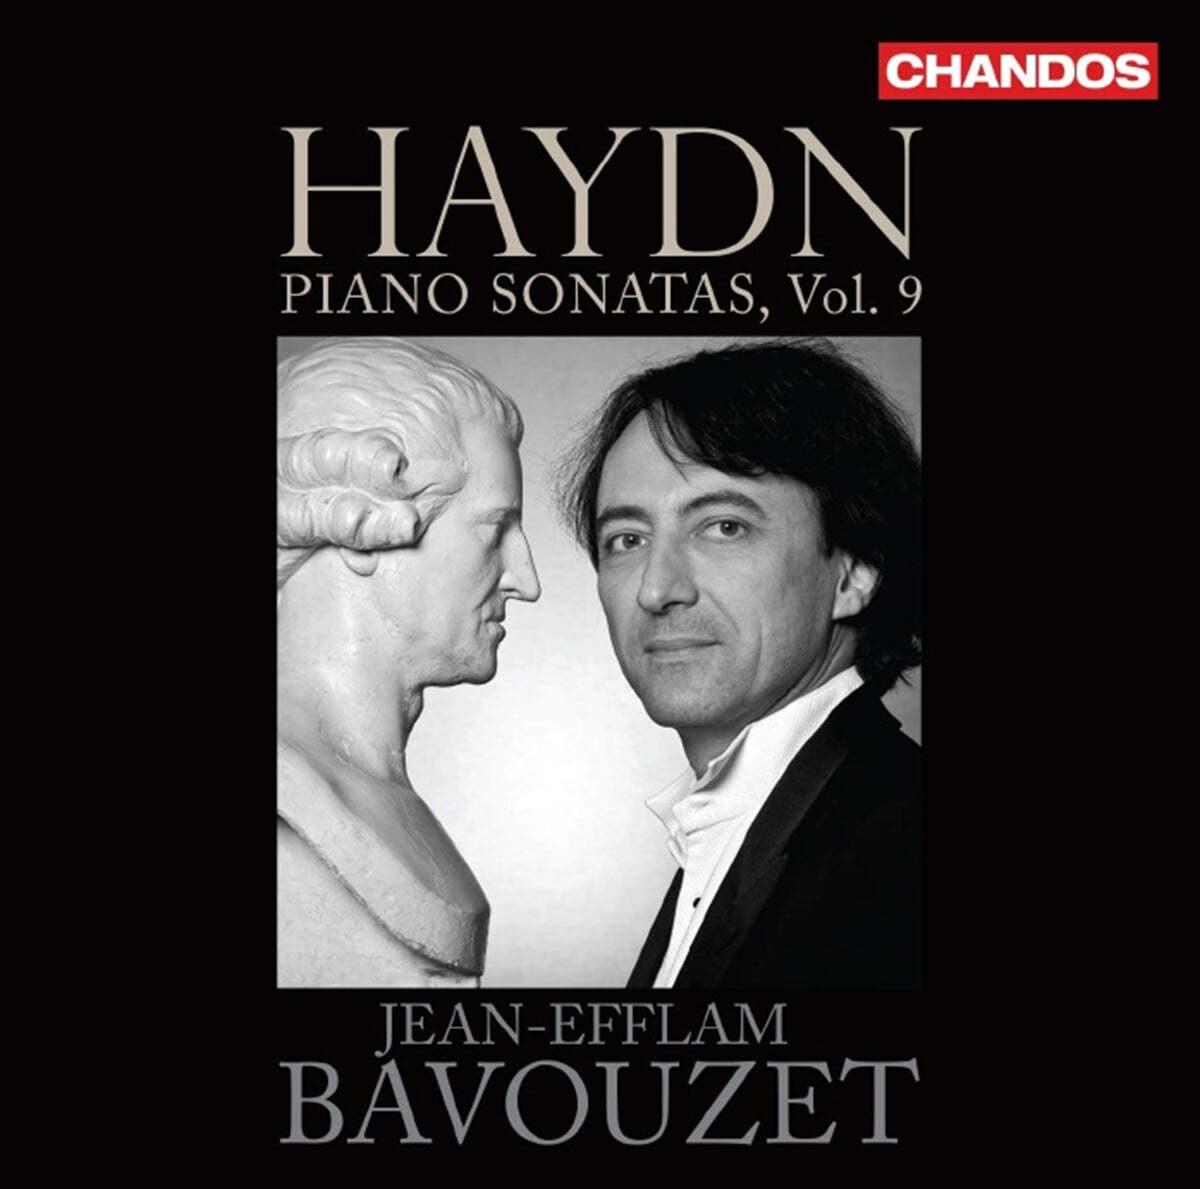 Jean-Efflam Bavouzet 하이든: 피아노 소나타 9집 - 장-에플랑 바부제 (Haydn: Piano Sonatas Vol. 9)